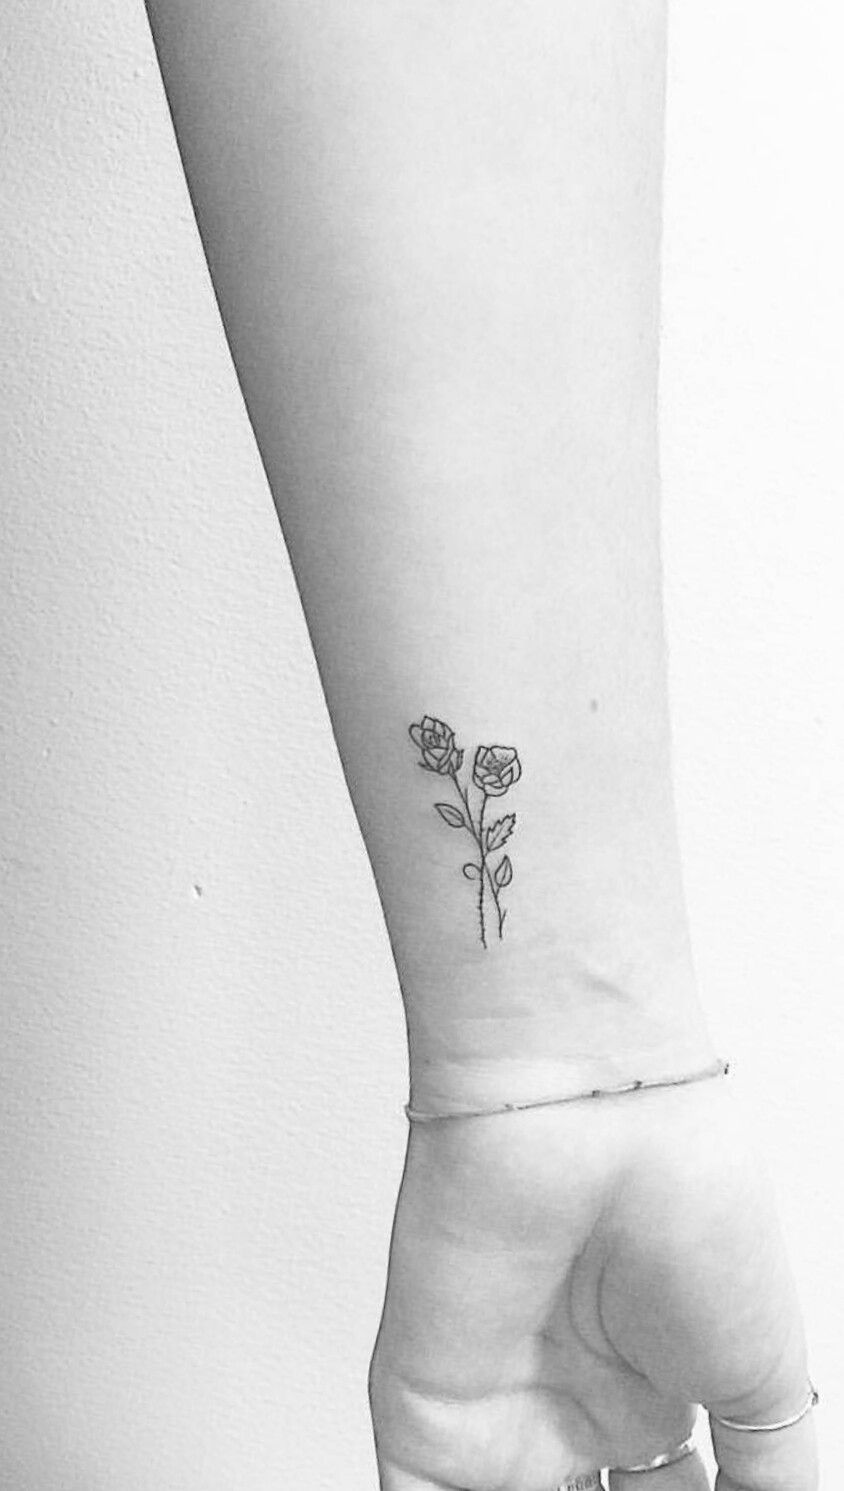 Tattoo Placement Carnation Flower Tattoo Tattoo Placement Chrysanthemum Tattoo